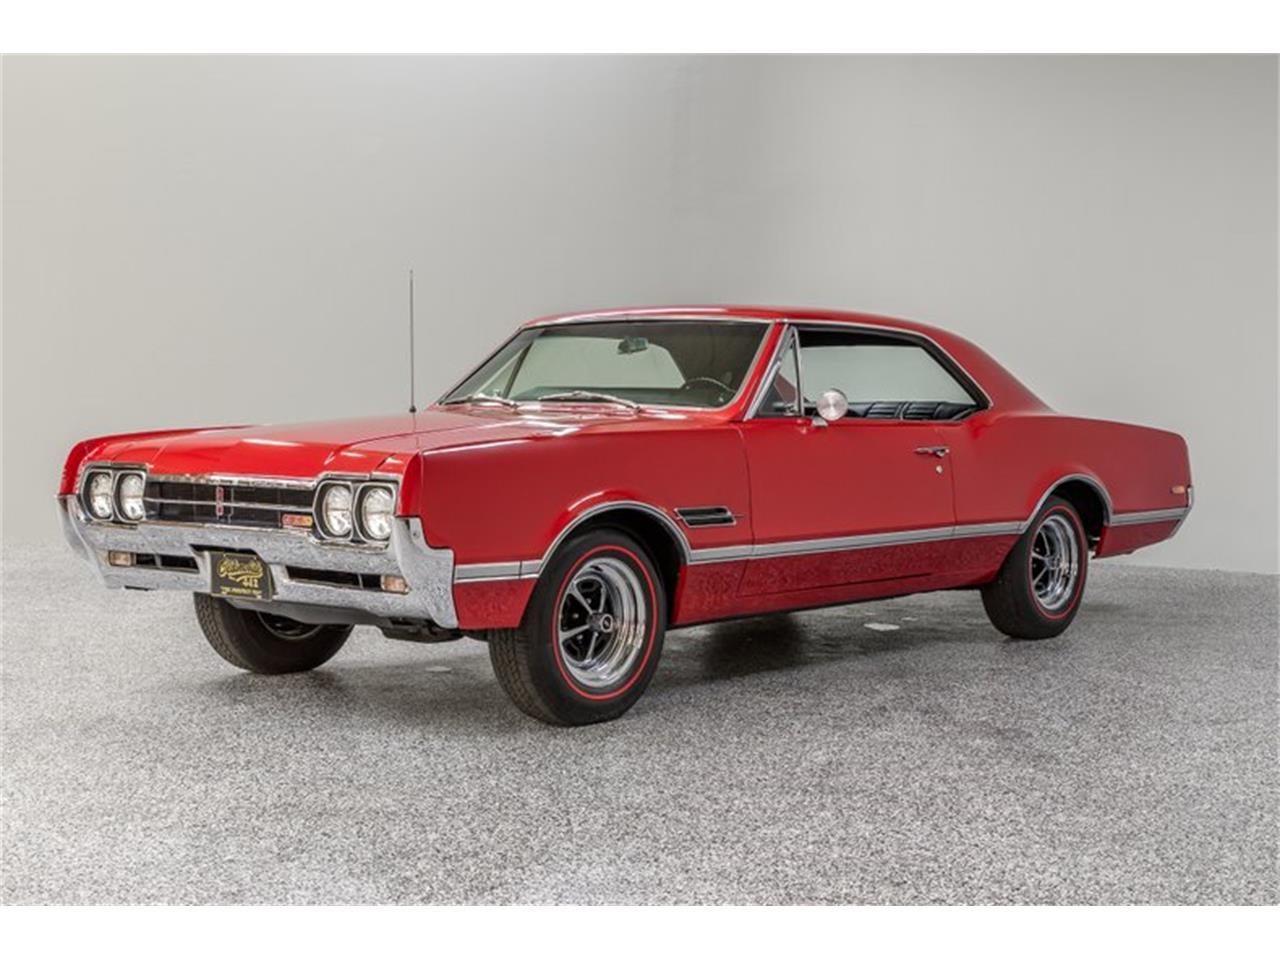 For Sale: 1966 Oldsmobile 442 in Concord, North Carolina